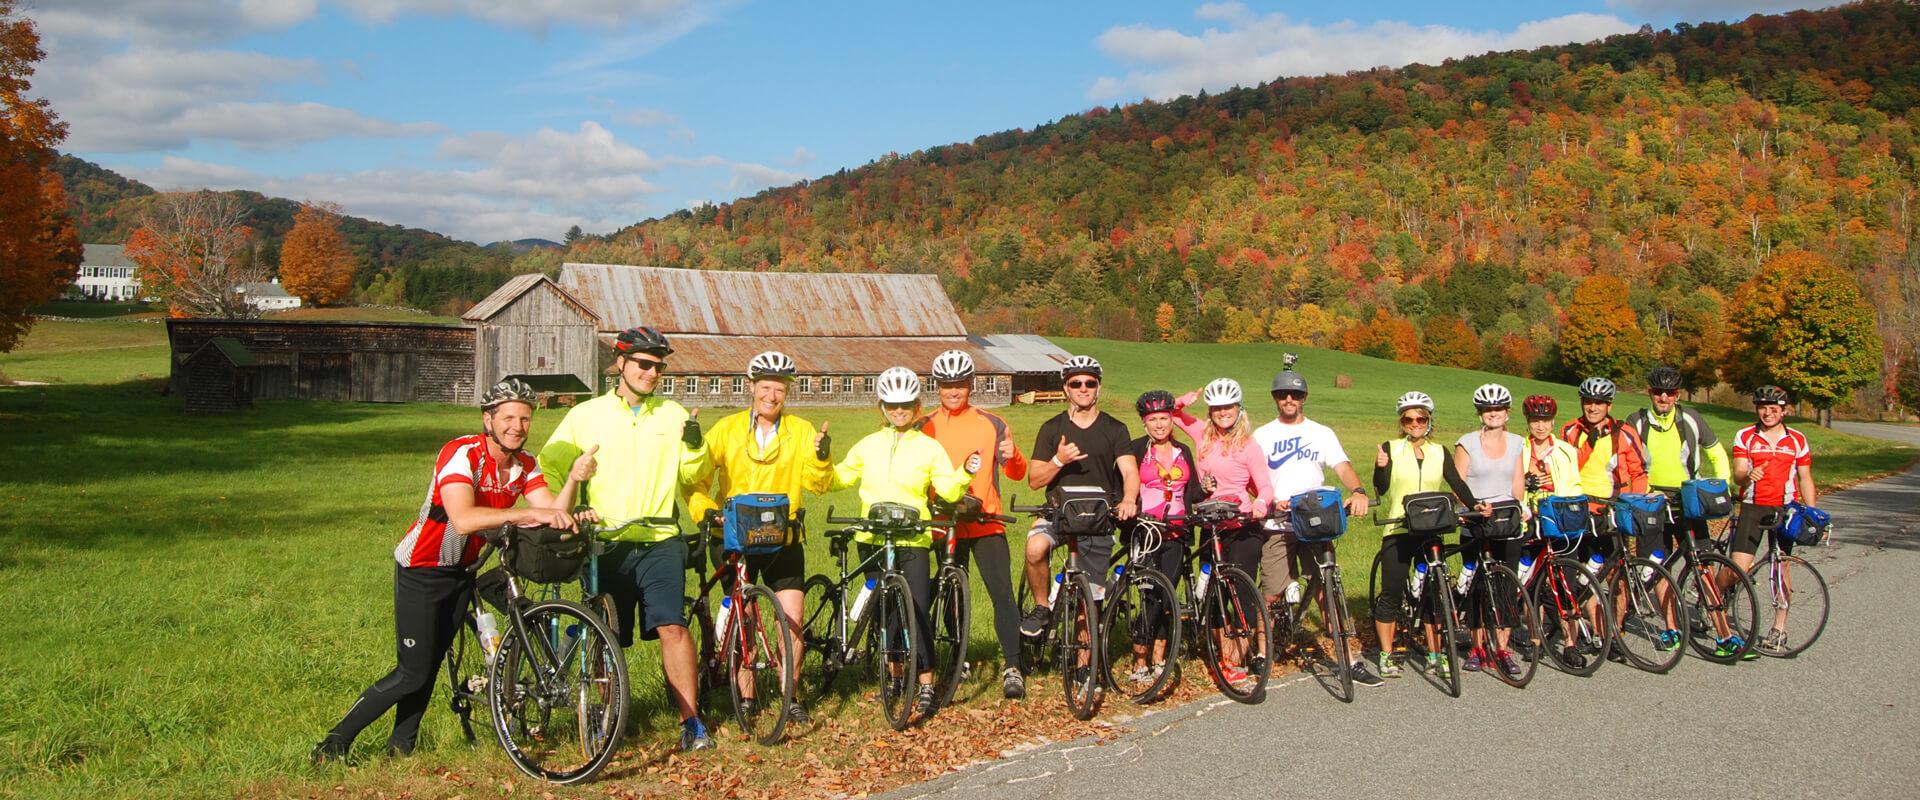 USA Bike Tours | Great Freedom Adventures